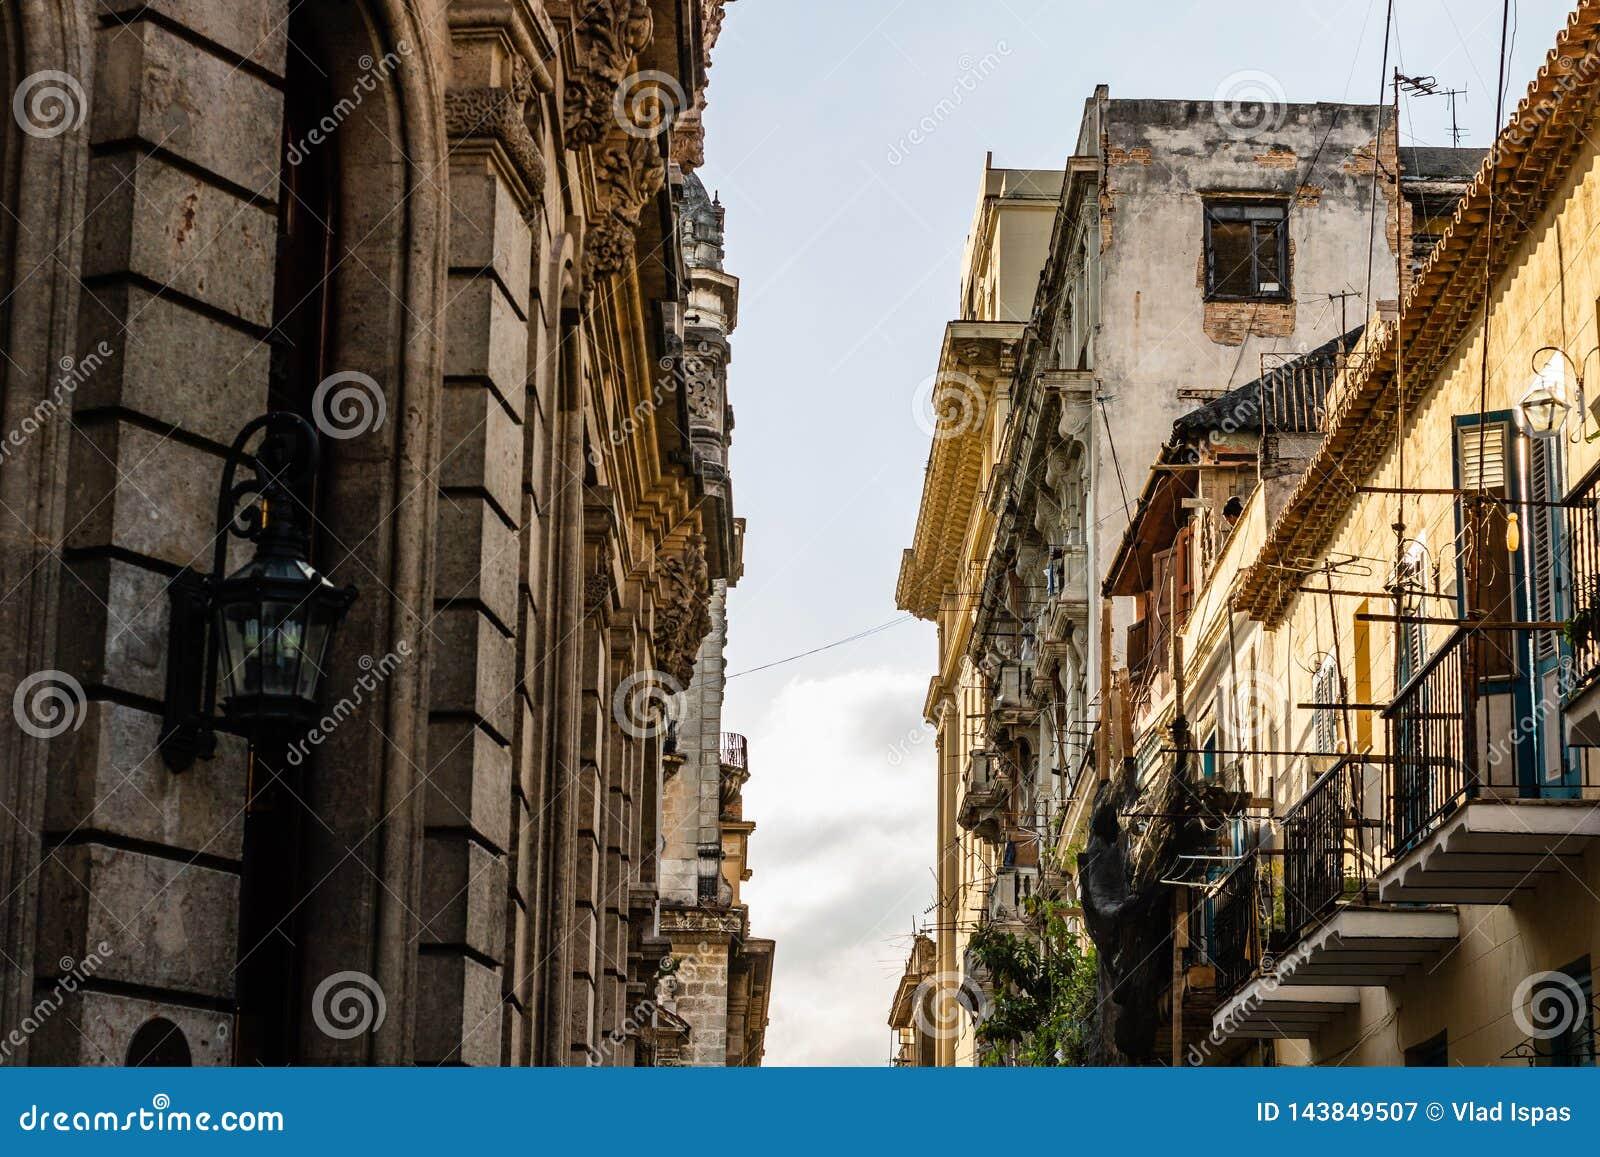 Facciata di vecchie costruzioni coloniali a Avana, Cuba